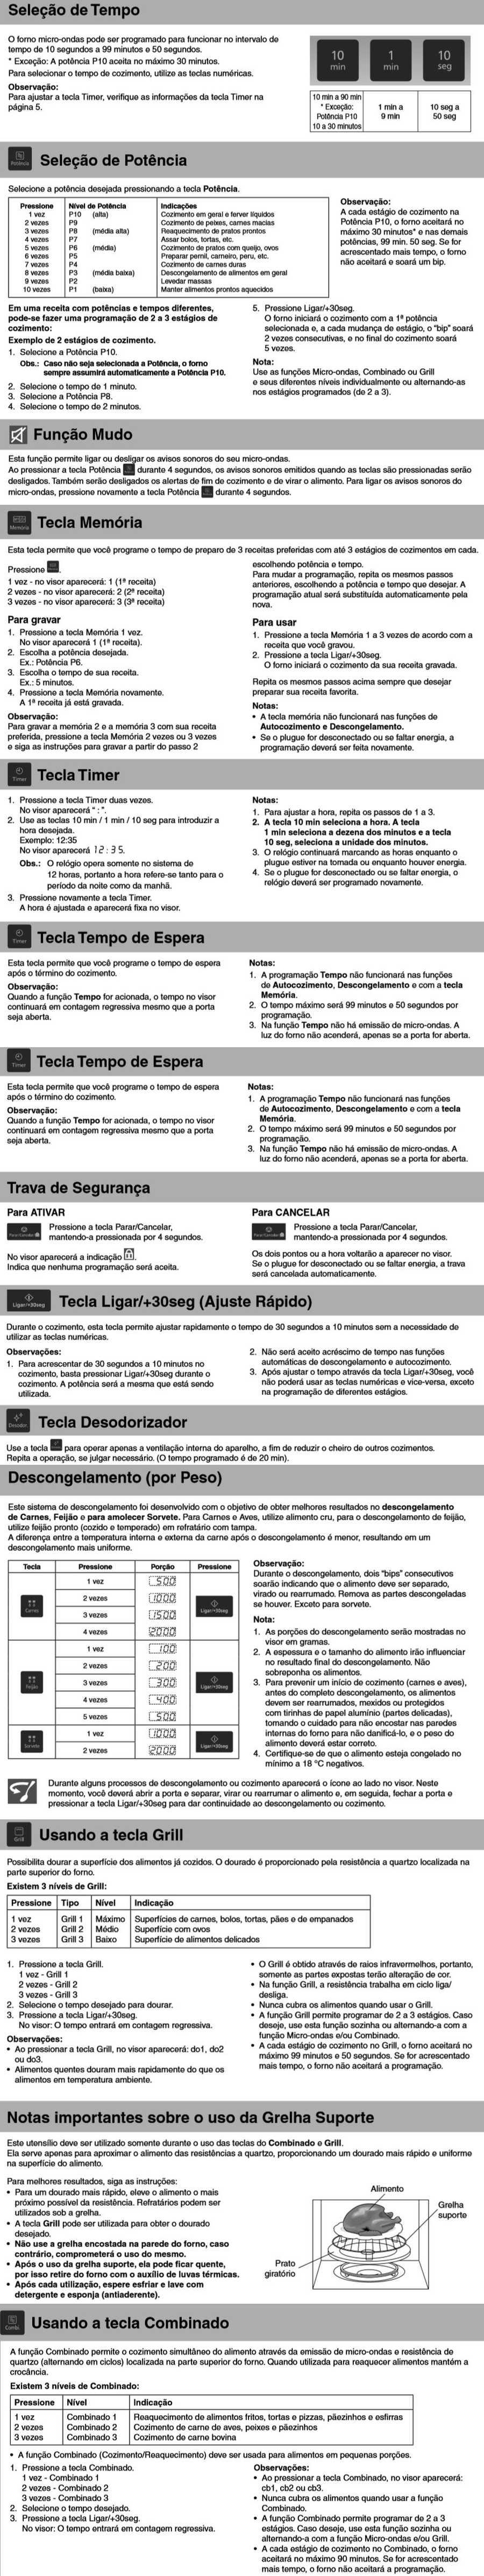 Manual de instruções do microondas Panasonic NN-GT68H - Funções